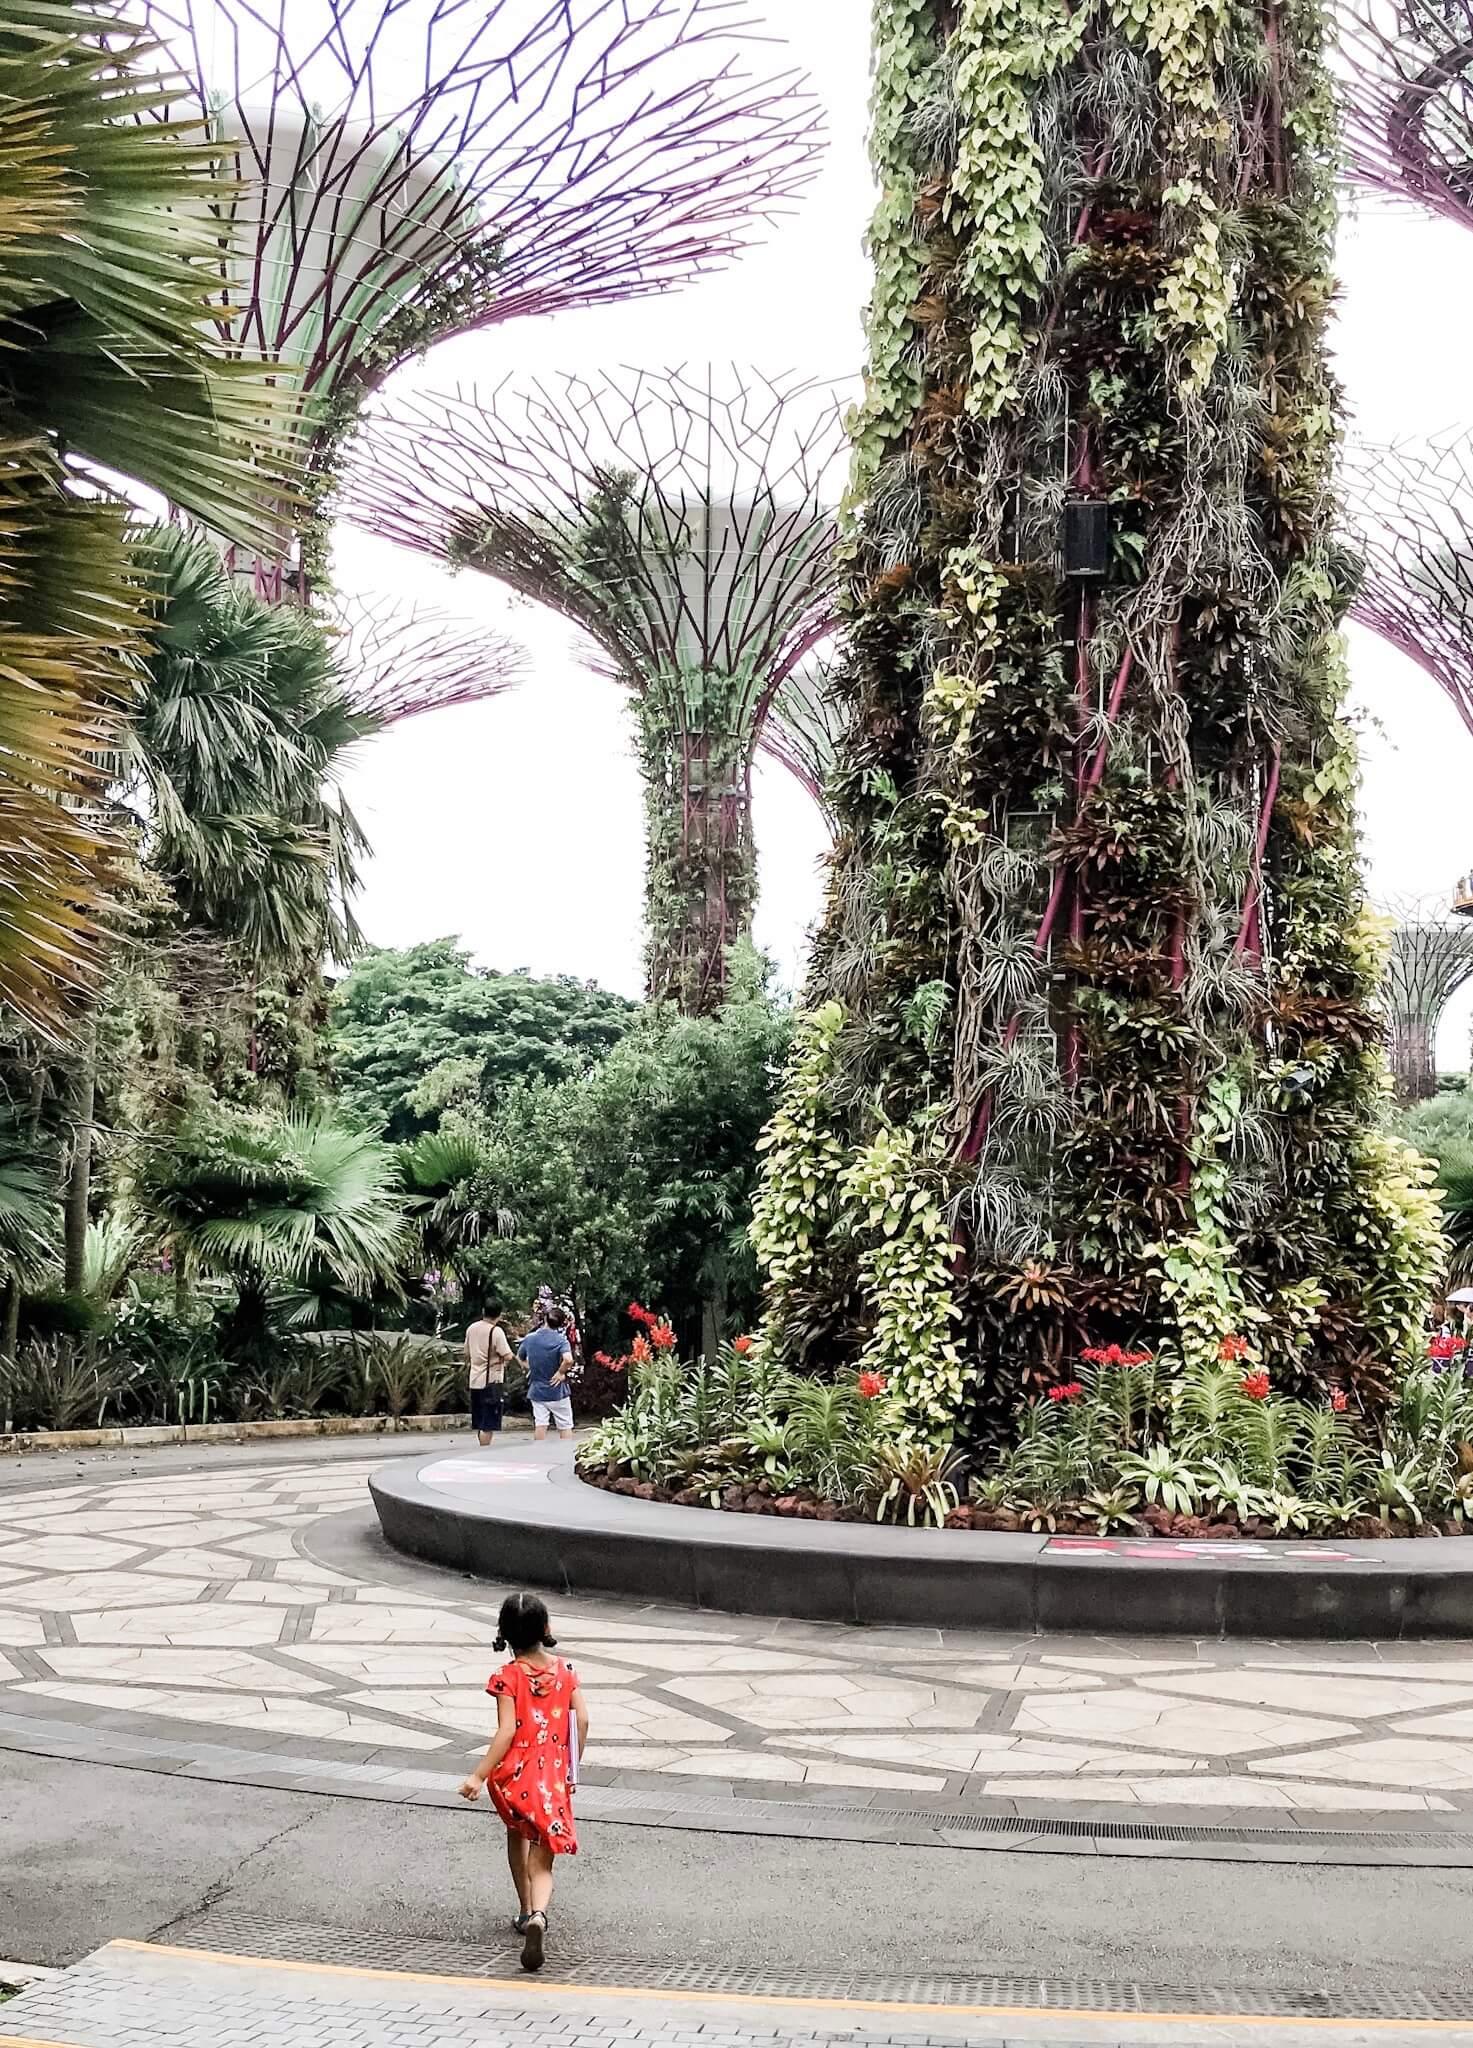 The Supertree Grove - Singapore